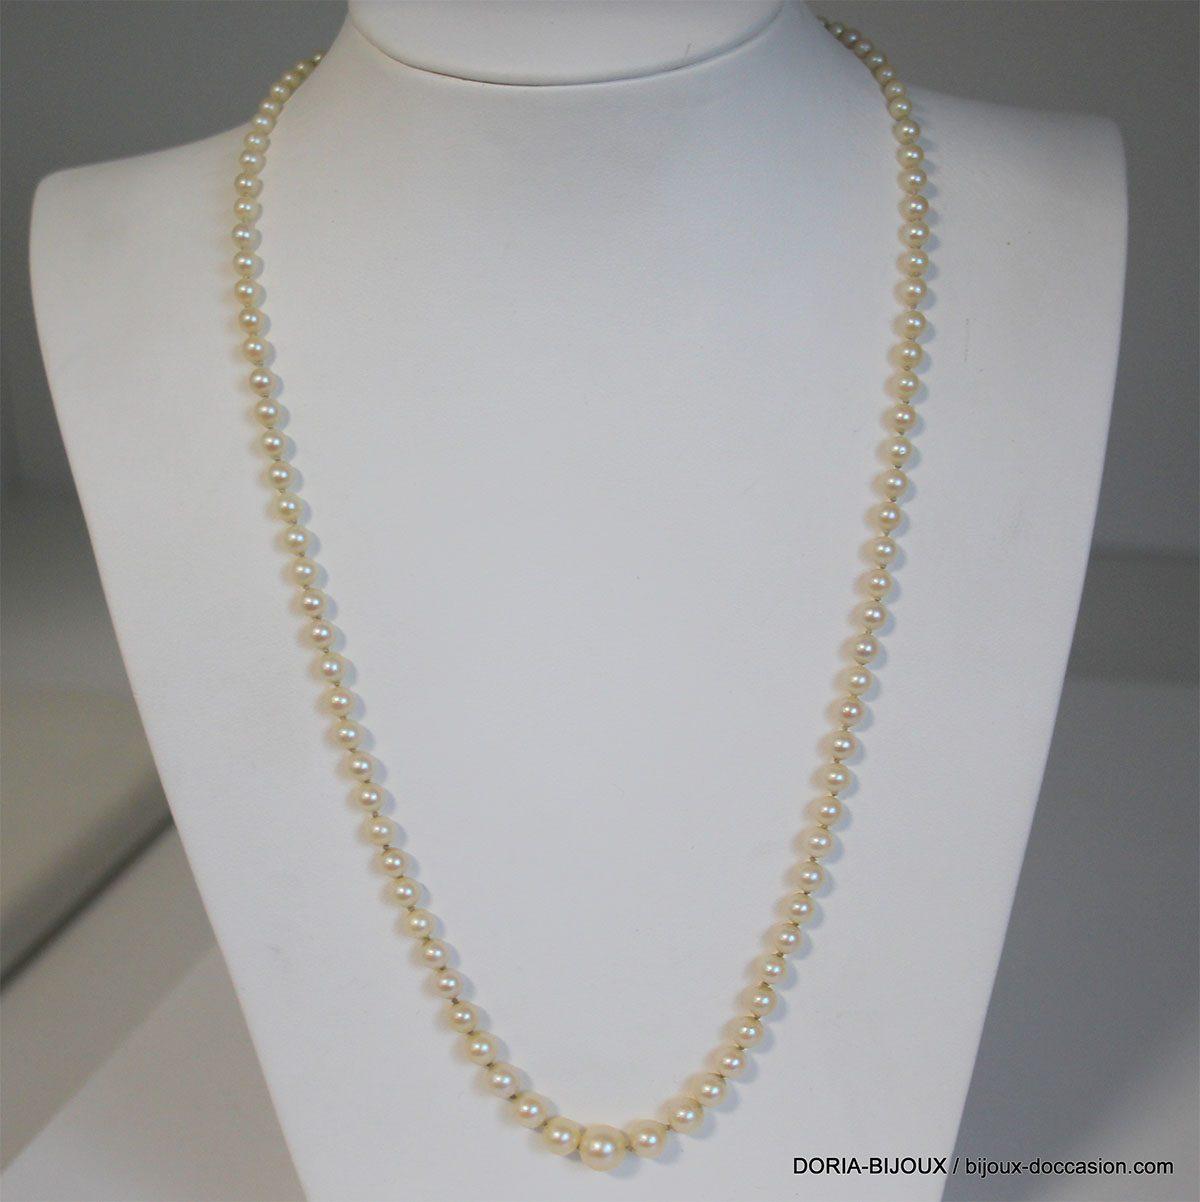 Collier Perles Or 18k 750 - 46cm- 12.7grs